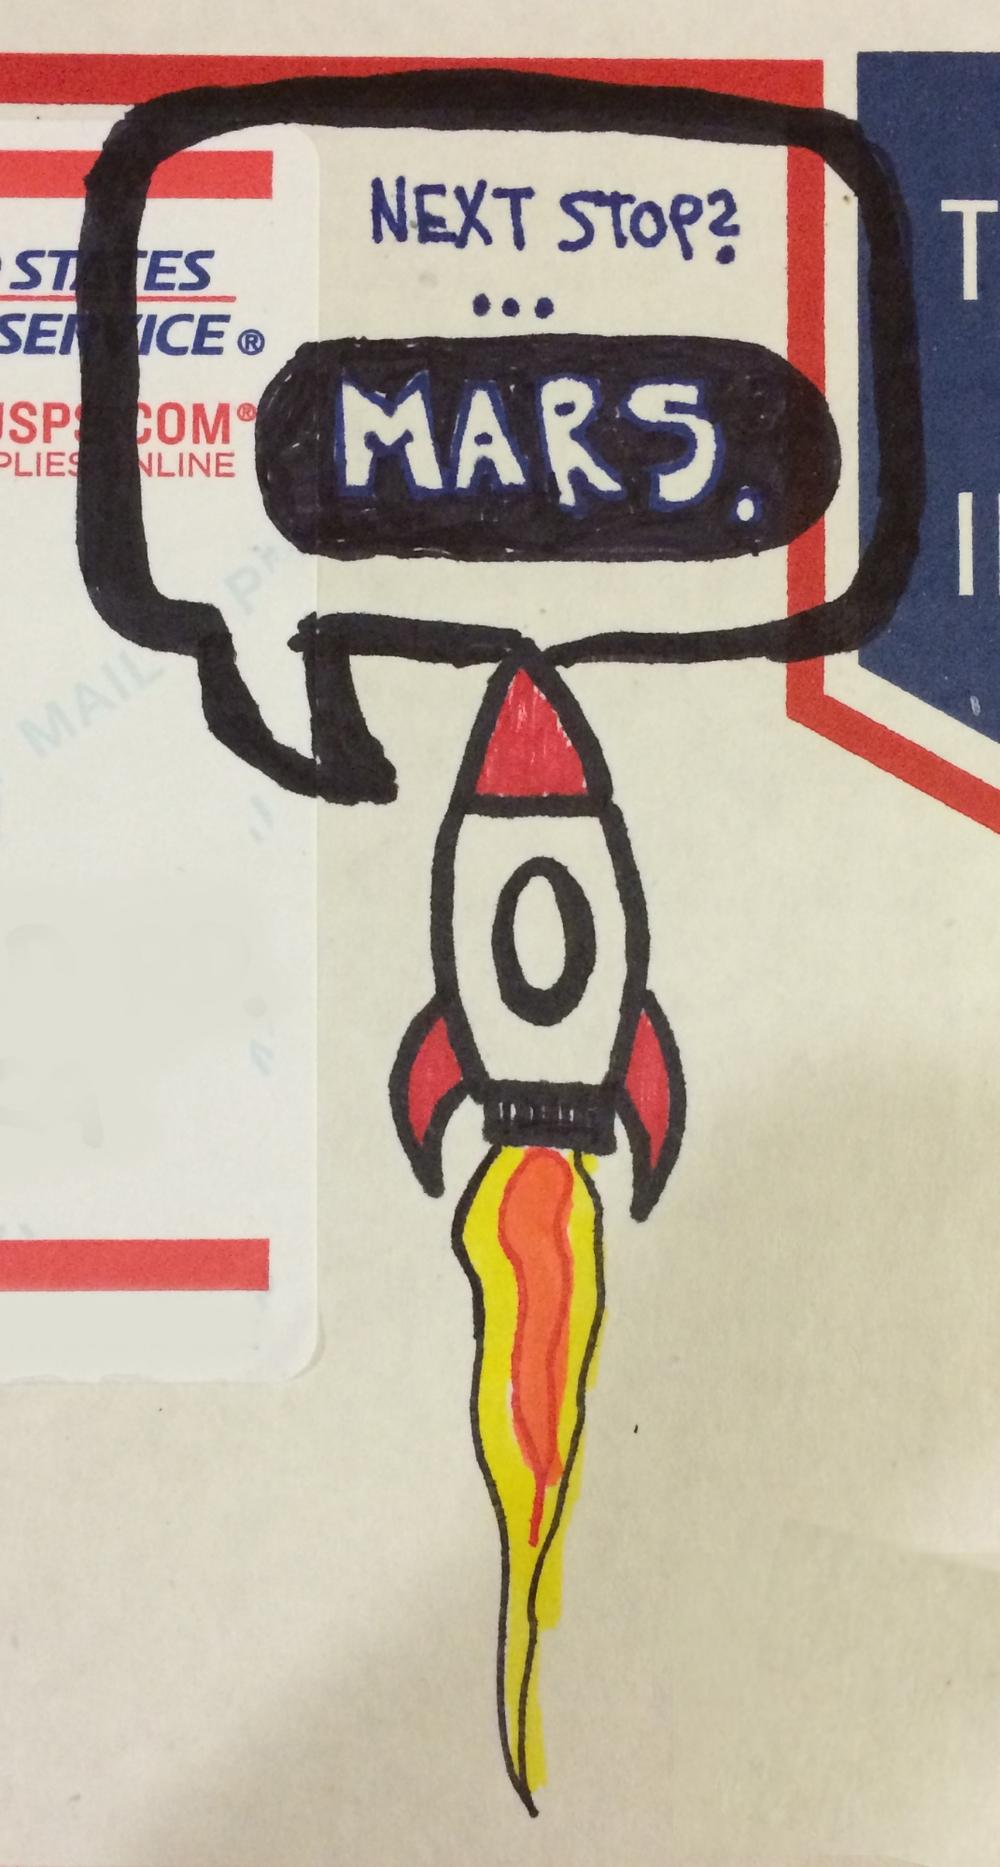 Next stop, Mars.